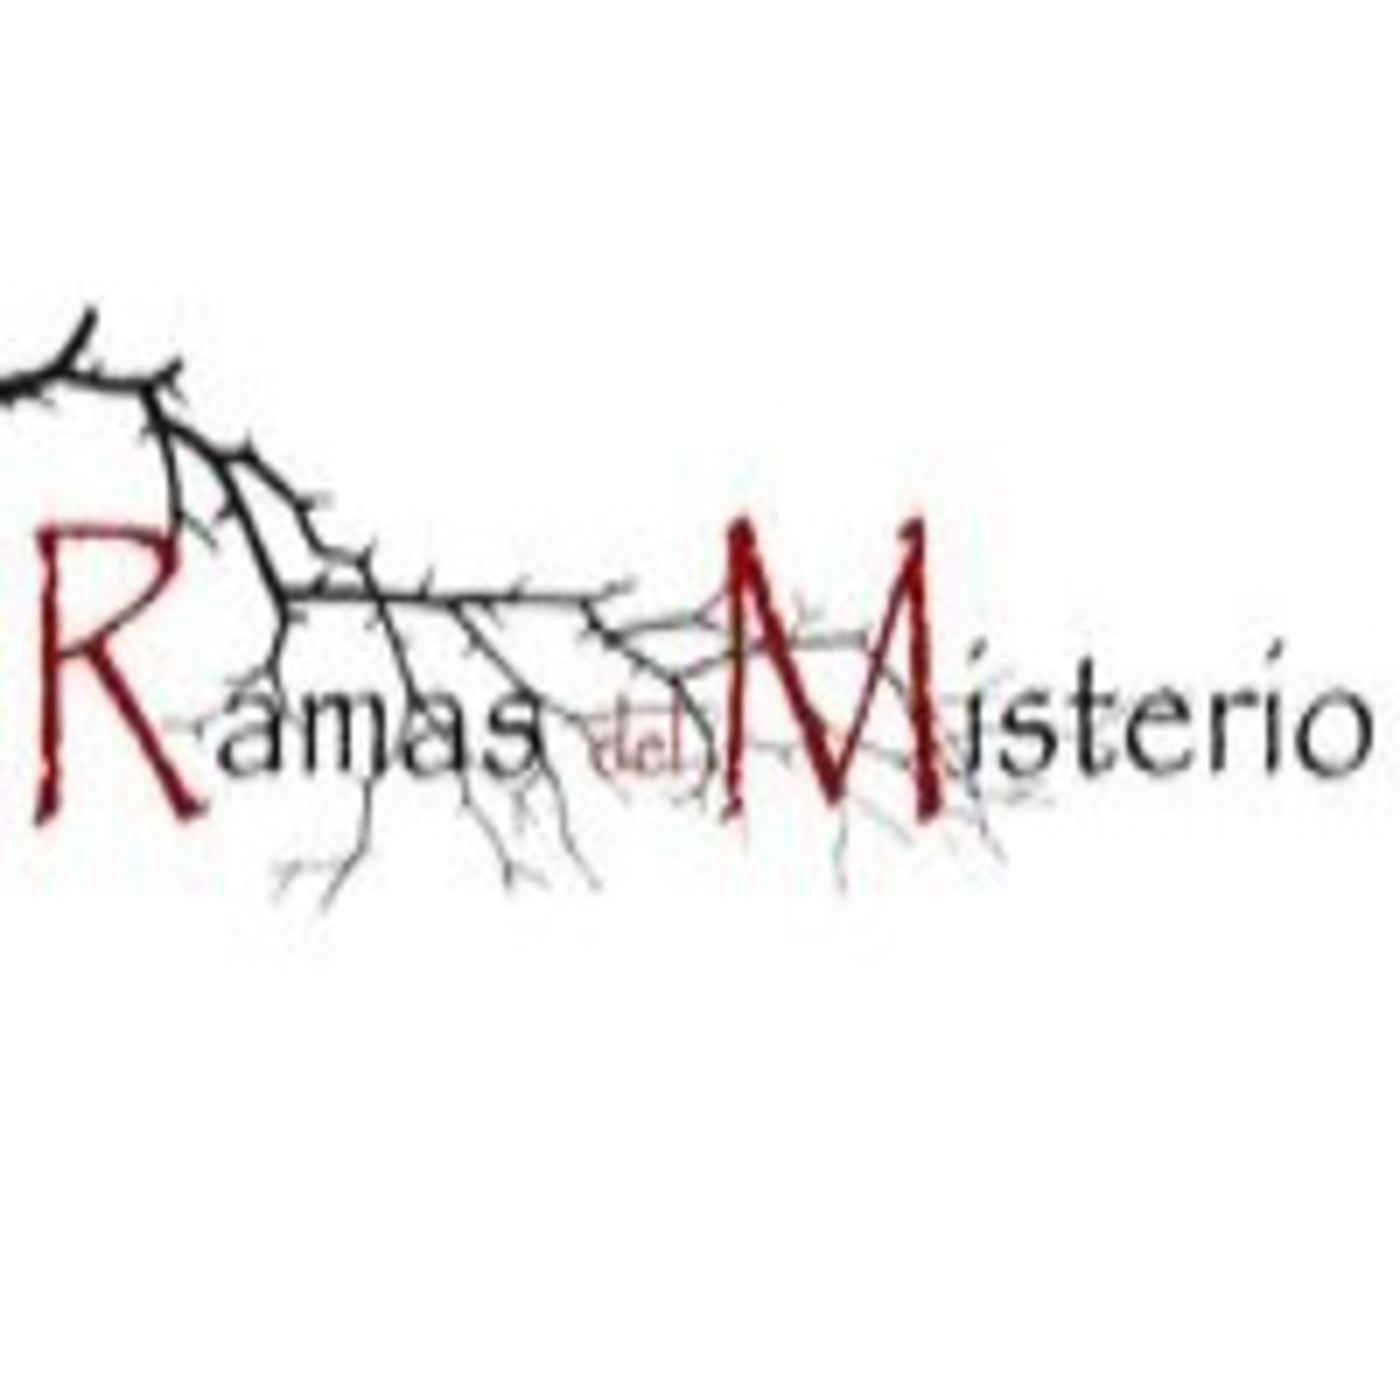 Ramas Del Misterio 2x02 - Exorcismos.